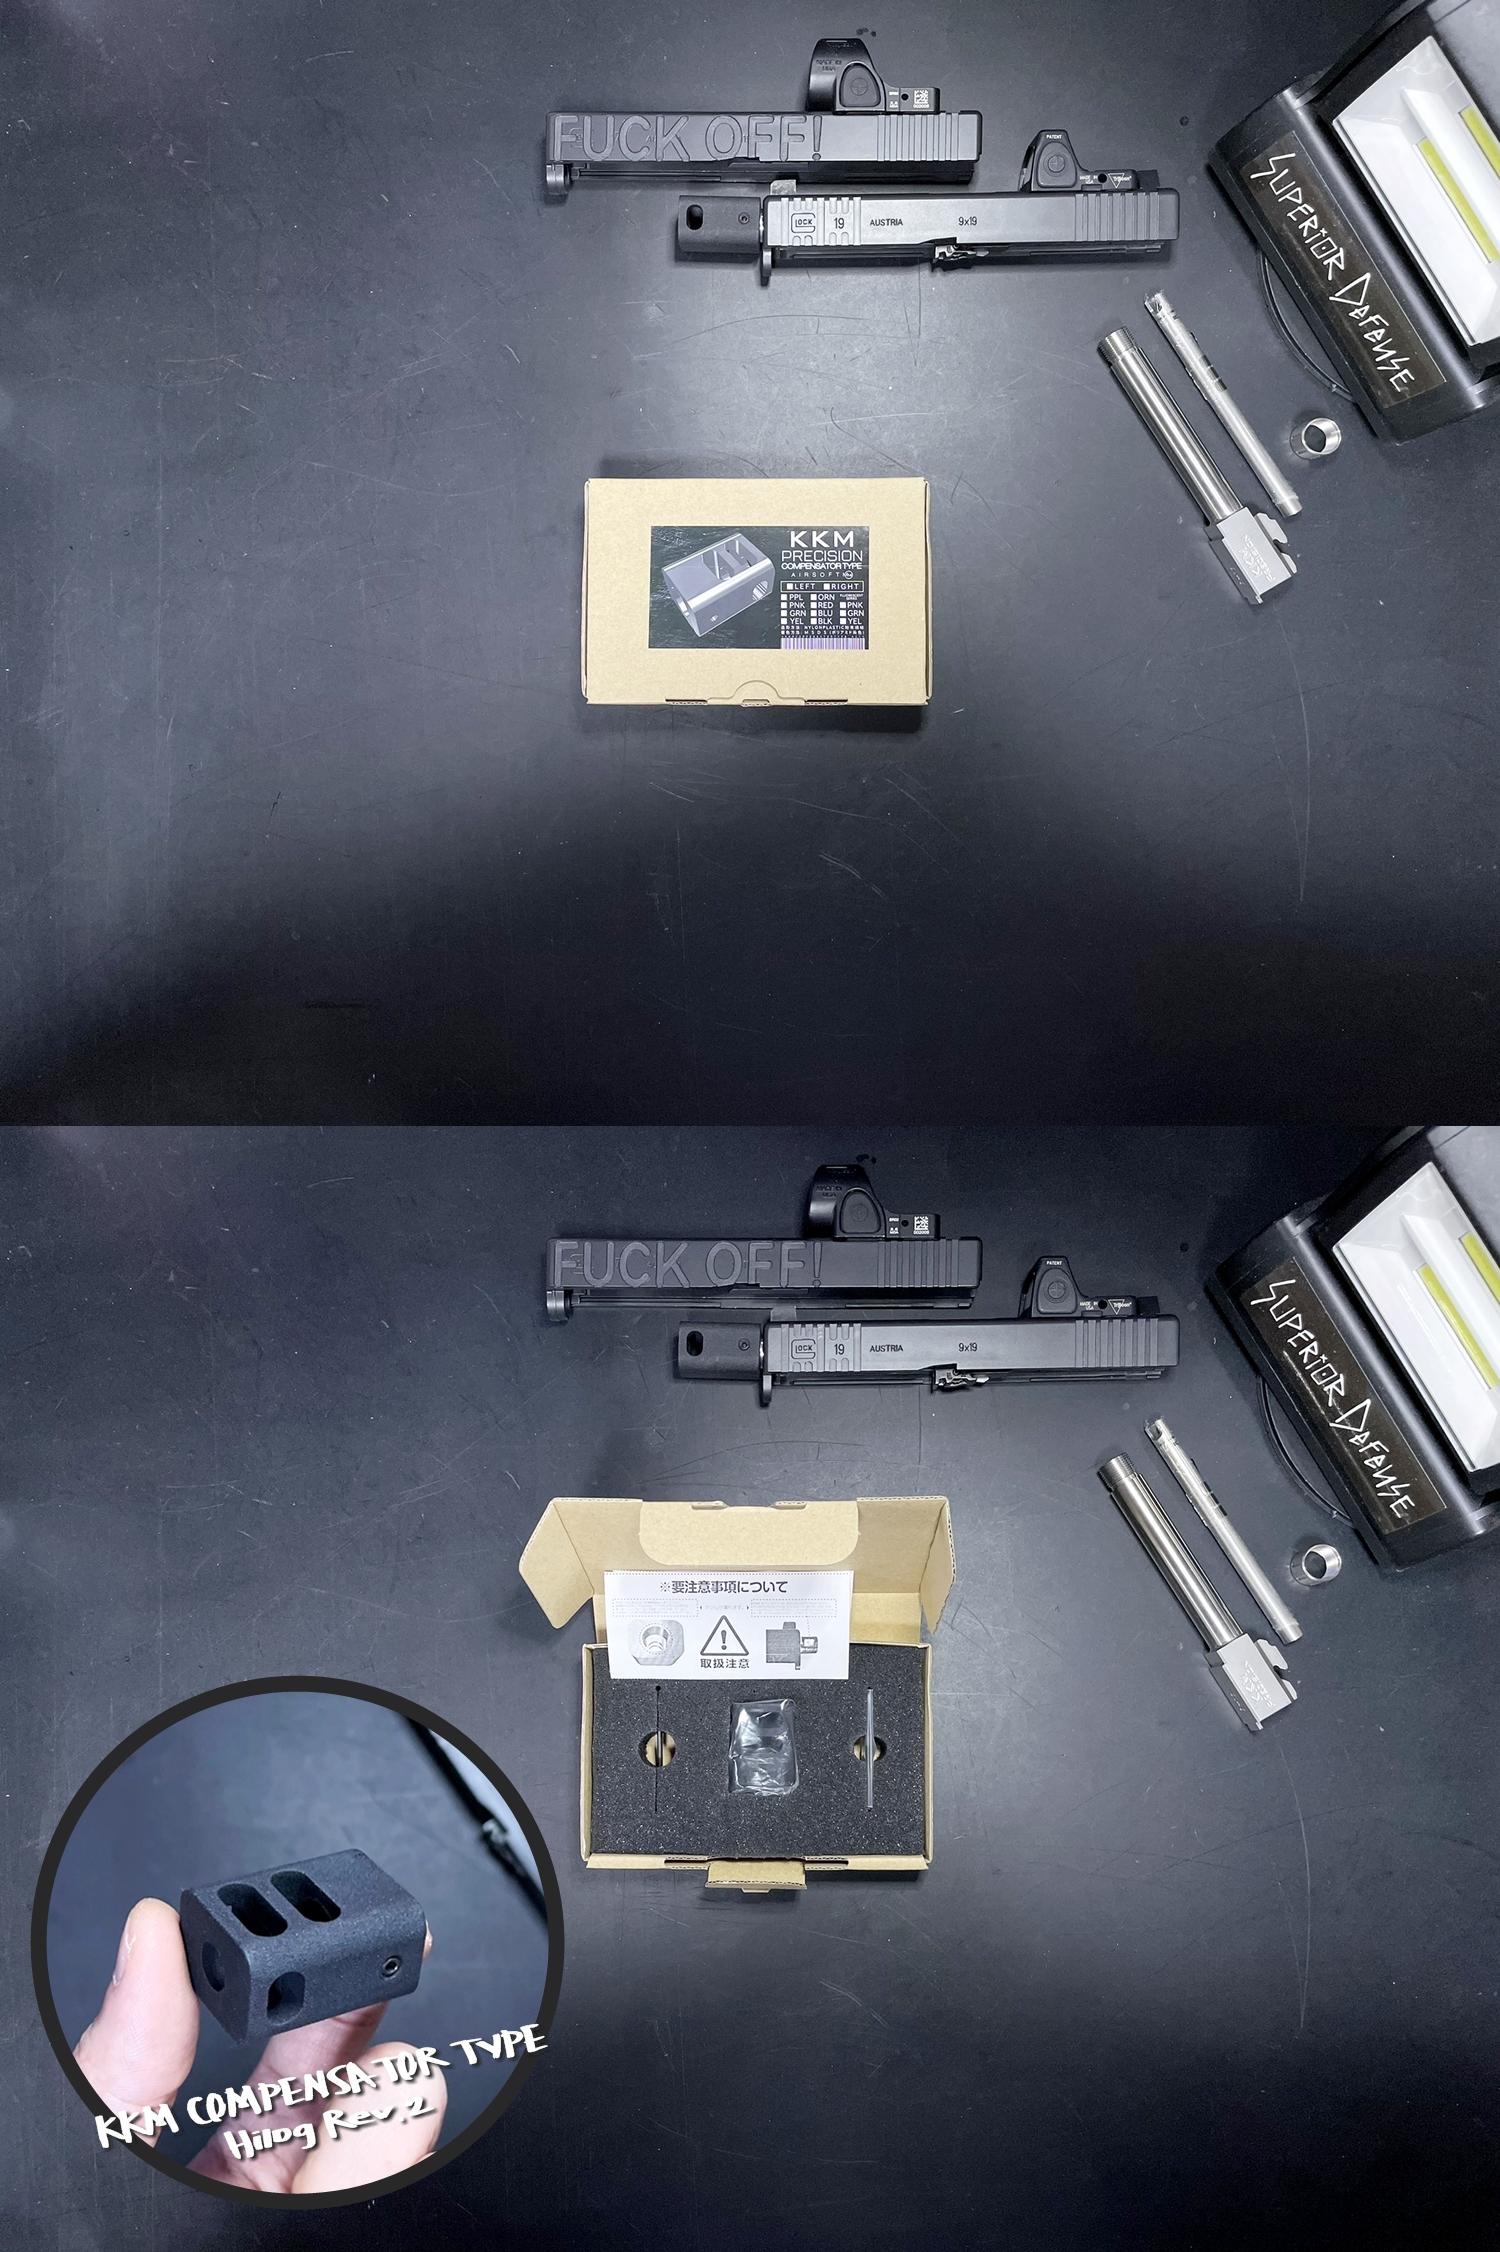 4 Guns Modify KKM PRECISION GLOCK ステンレスアウターバレル 東京マルイ G17 G18C GBB GET! リアルで重量感あるCNC 精密切り出し加工! BARREL+PROTECTOR+ショートリコイルアシストスプリング+インナーバレルセット